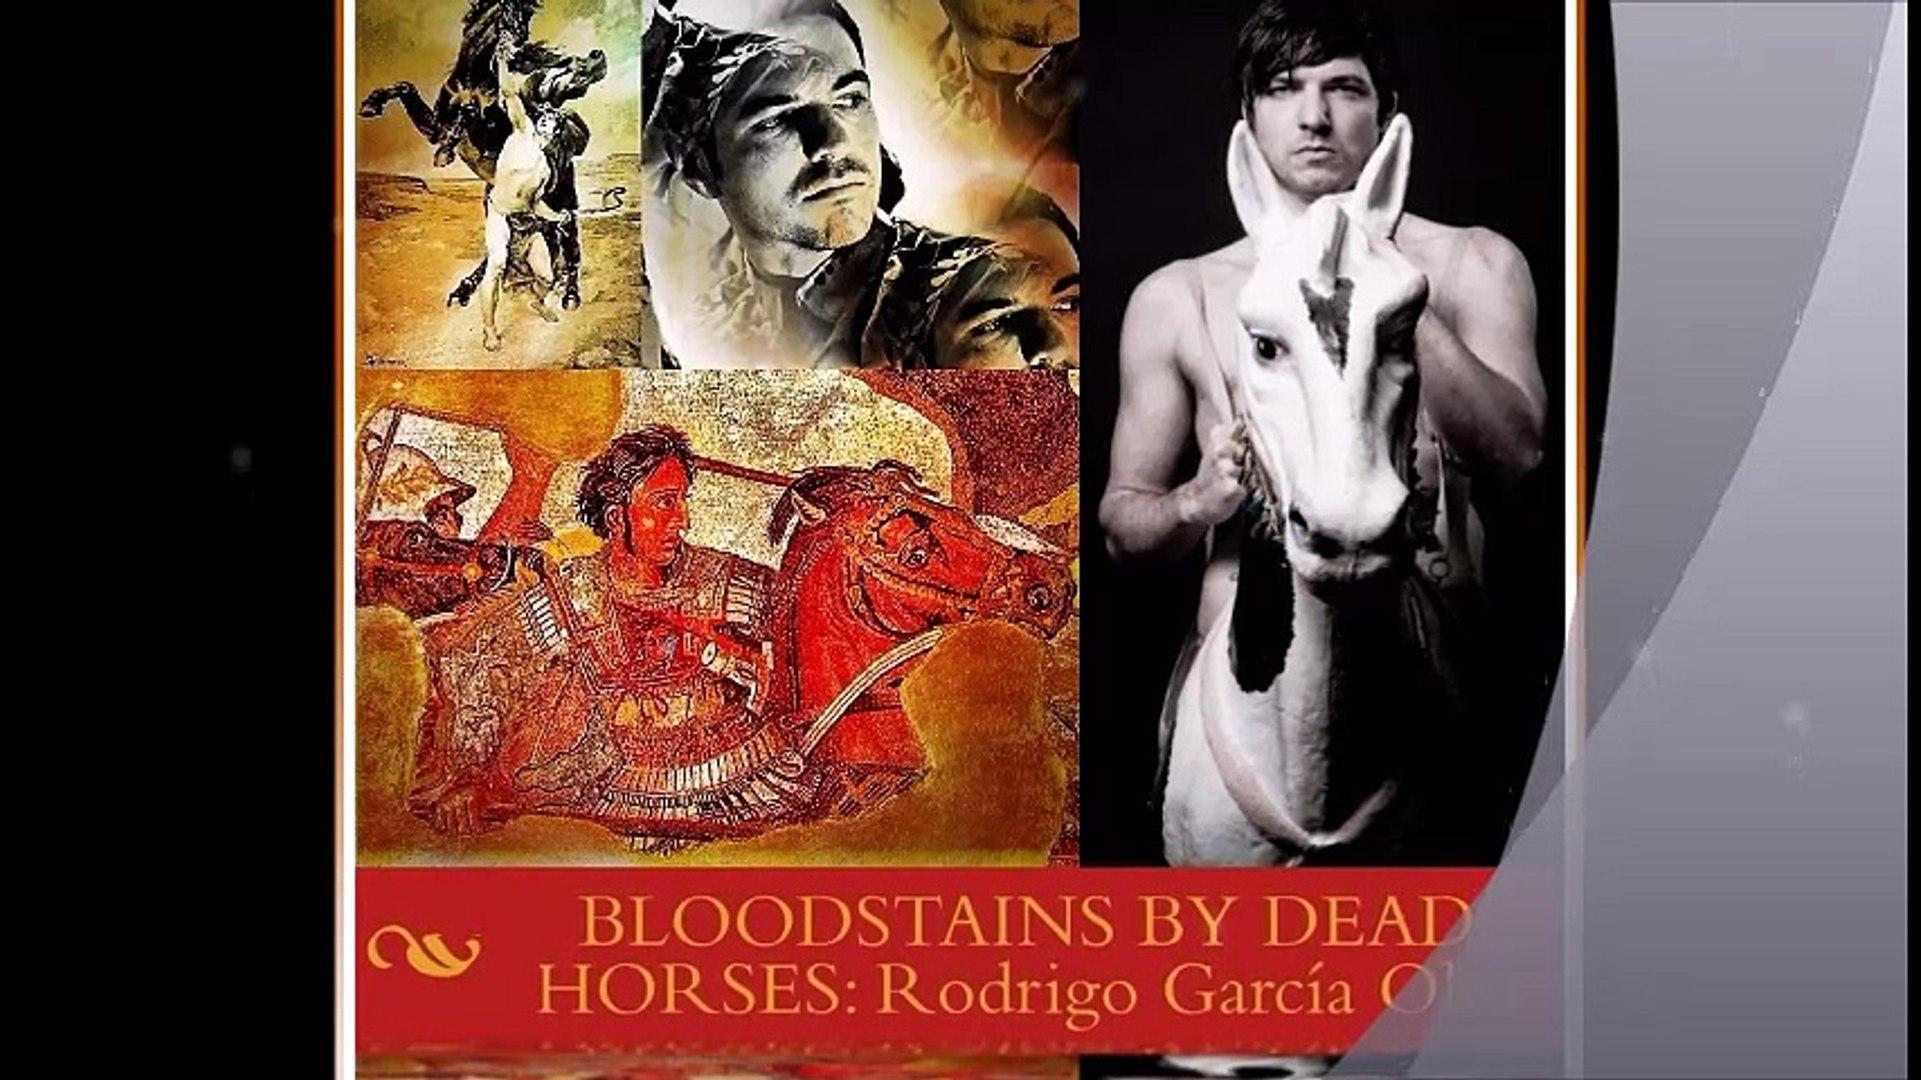 BLOODSTAINS BY DEAD HORSES Rodrigo García Olza (Official) Trailer